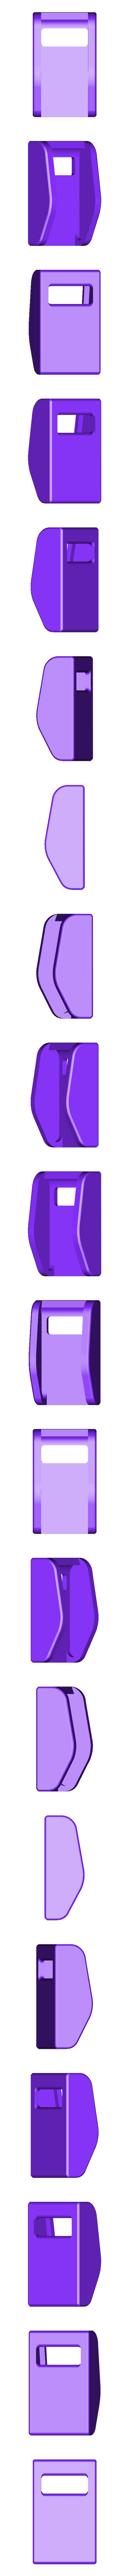 1-_Lashing_Strap_Cover.stl Download free STL file Tie-down strap covers • 3D printer template, WalterHsiao